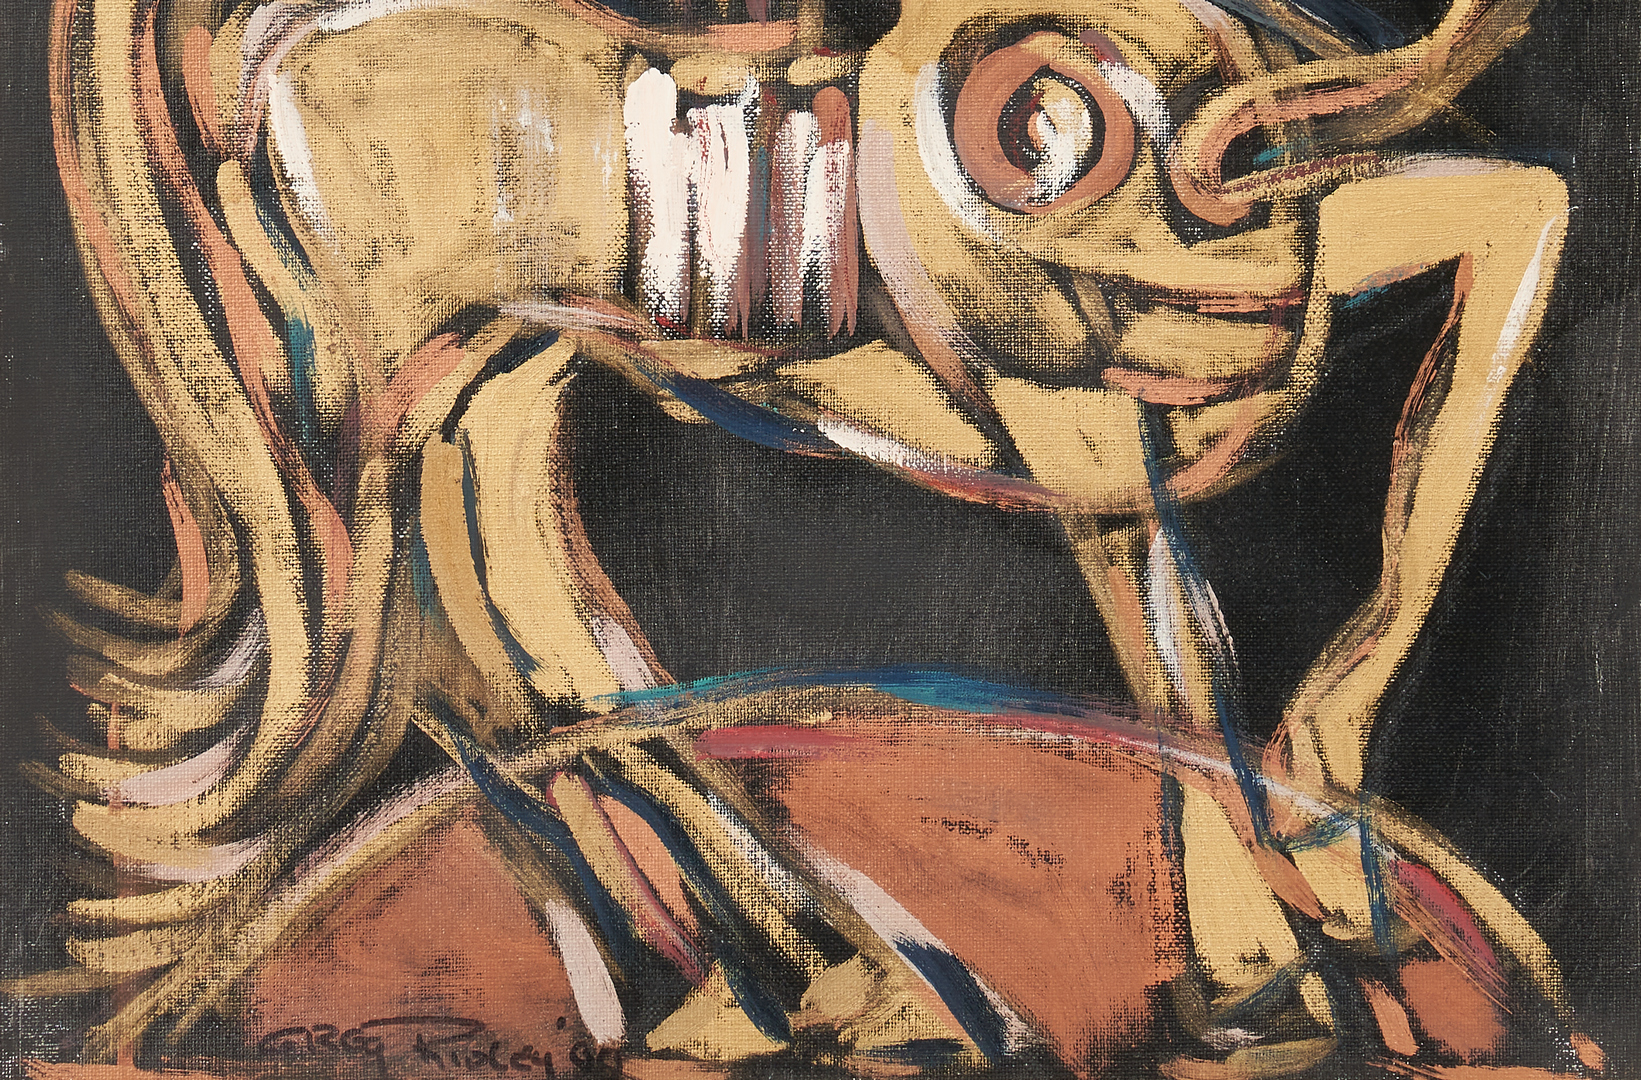 Lot 572: Greg Ridley Oil on Board Painting, Centaur